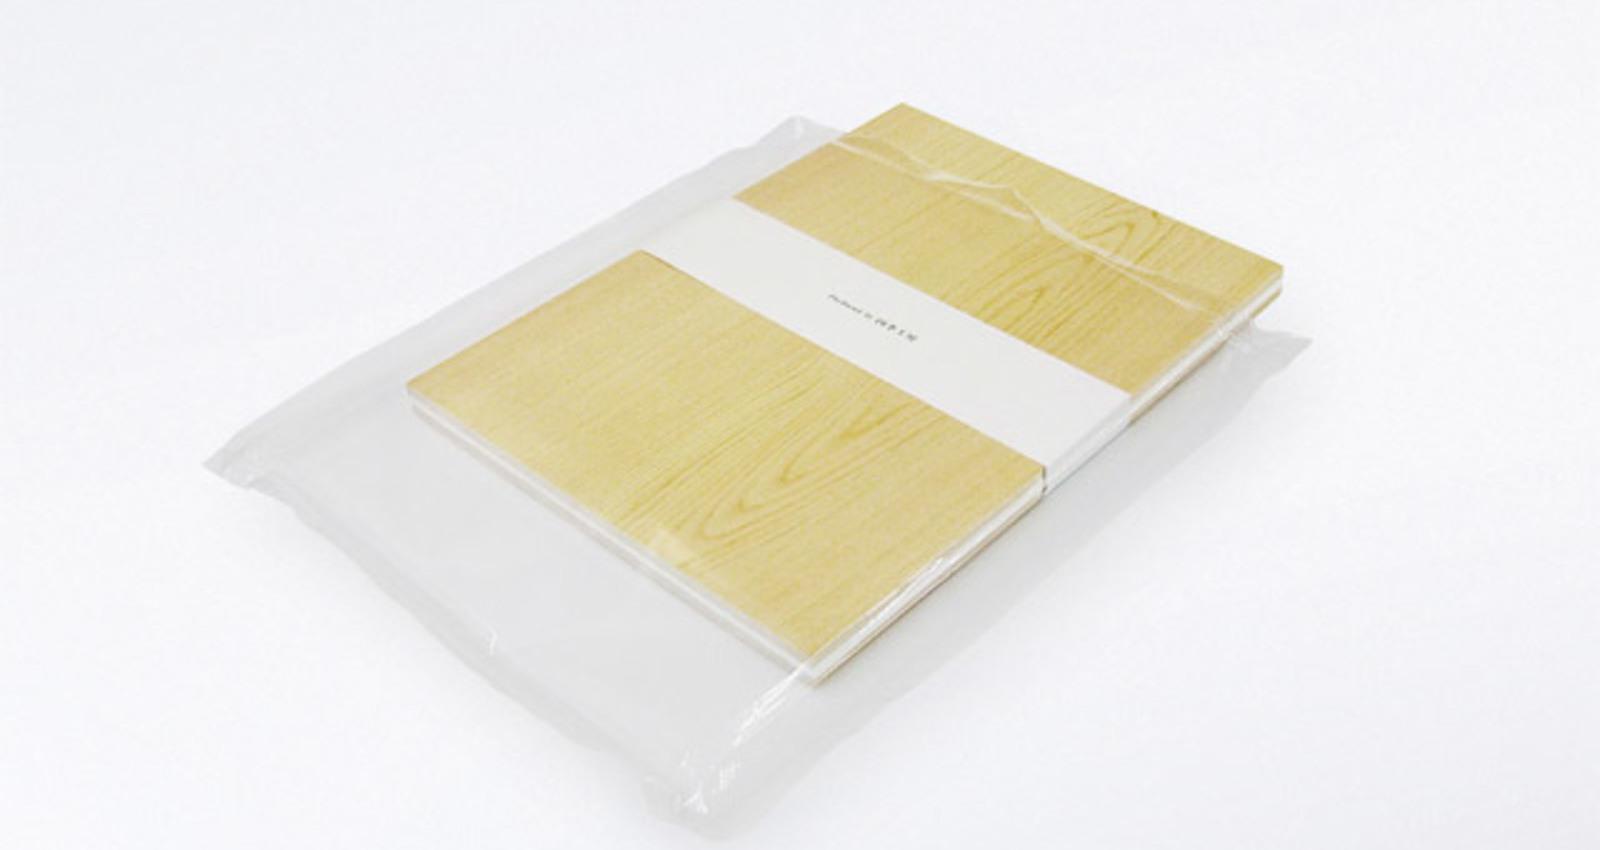 Shiki Kobo/A Book, Made by Wood